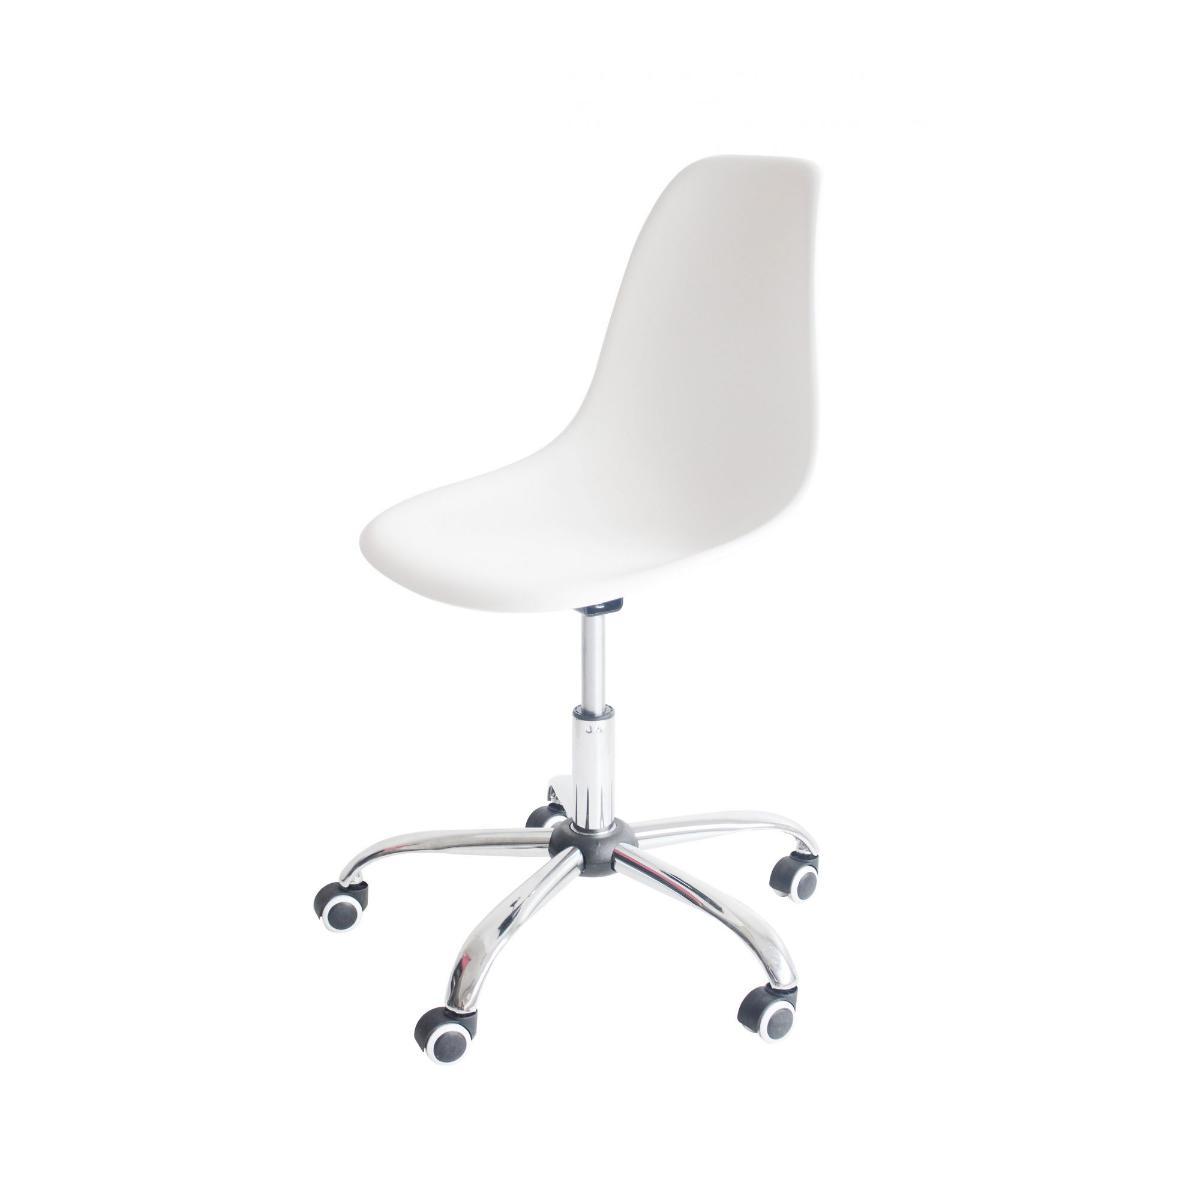 Cadeira Eiffel Office Eames Branca Base Cromada Giratória